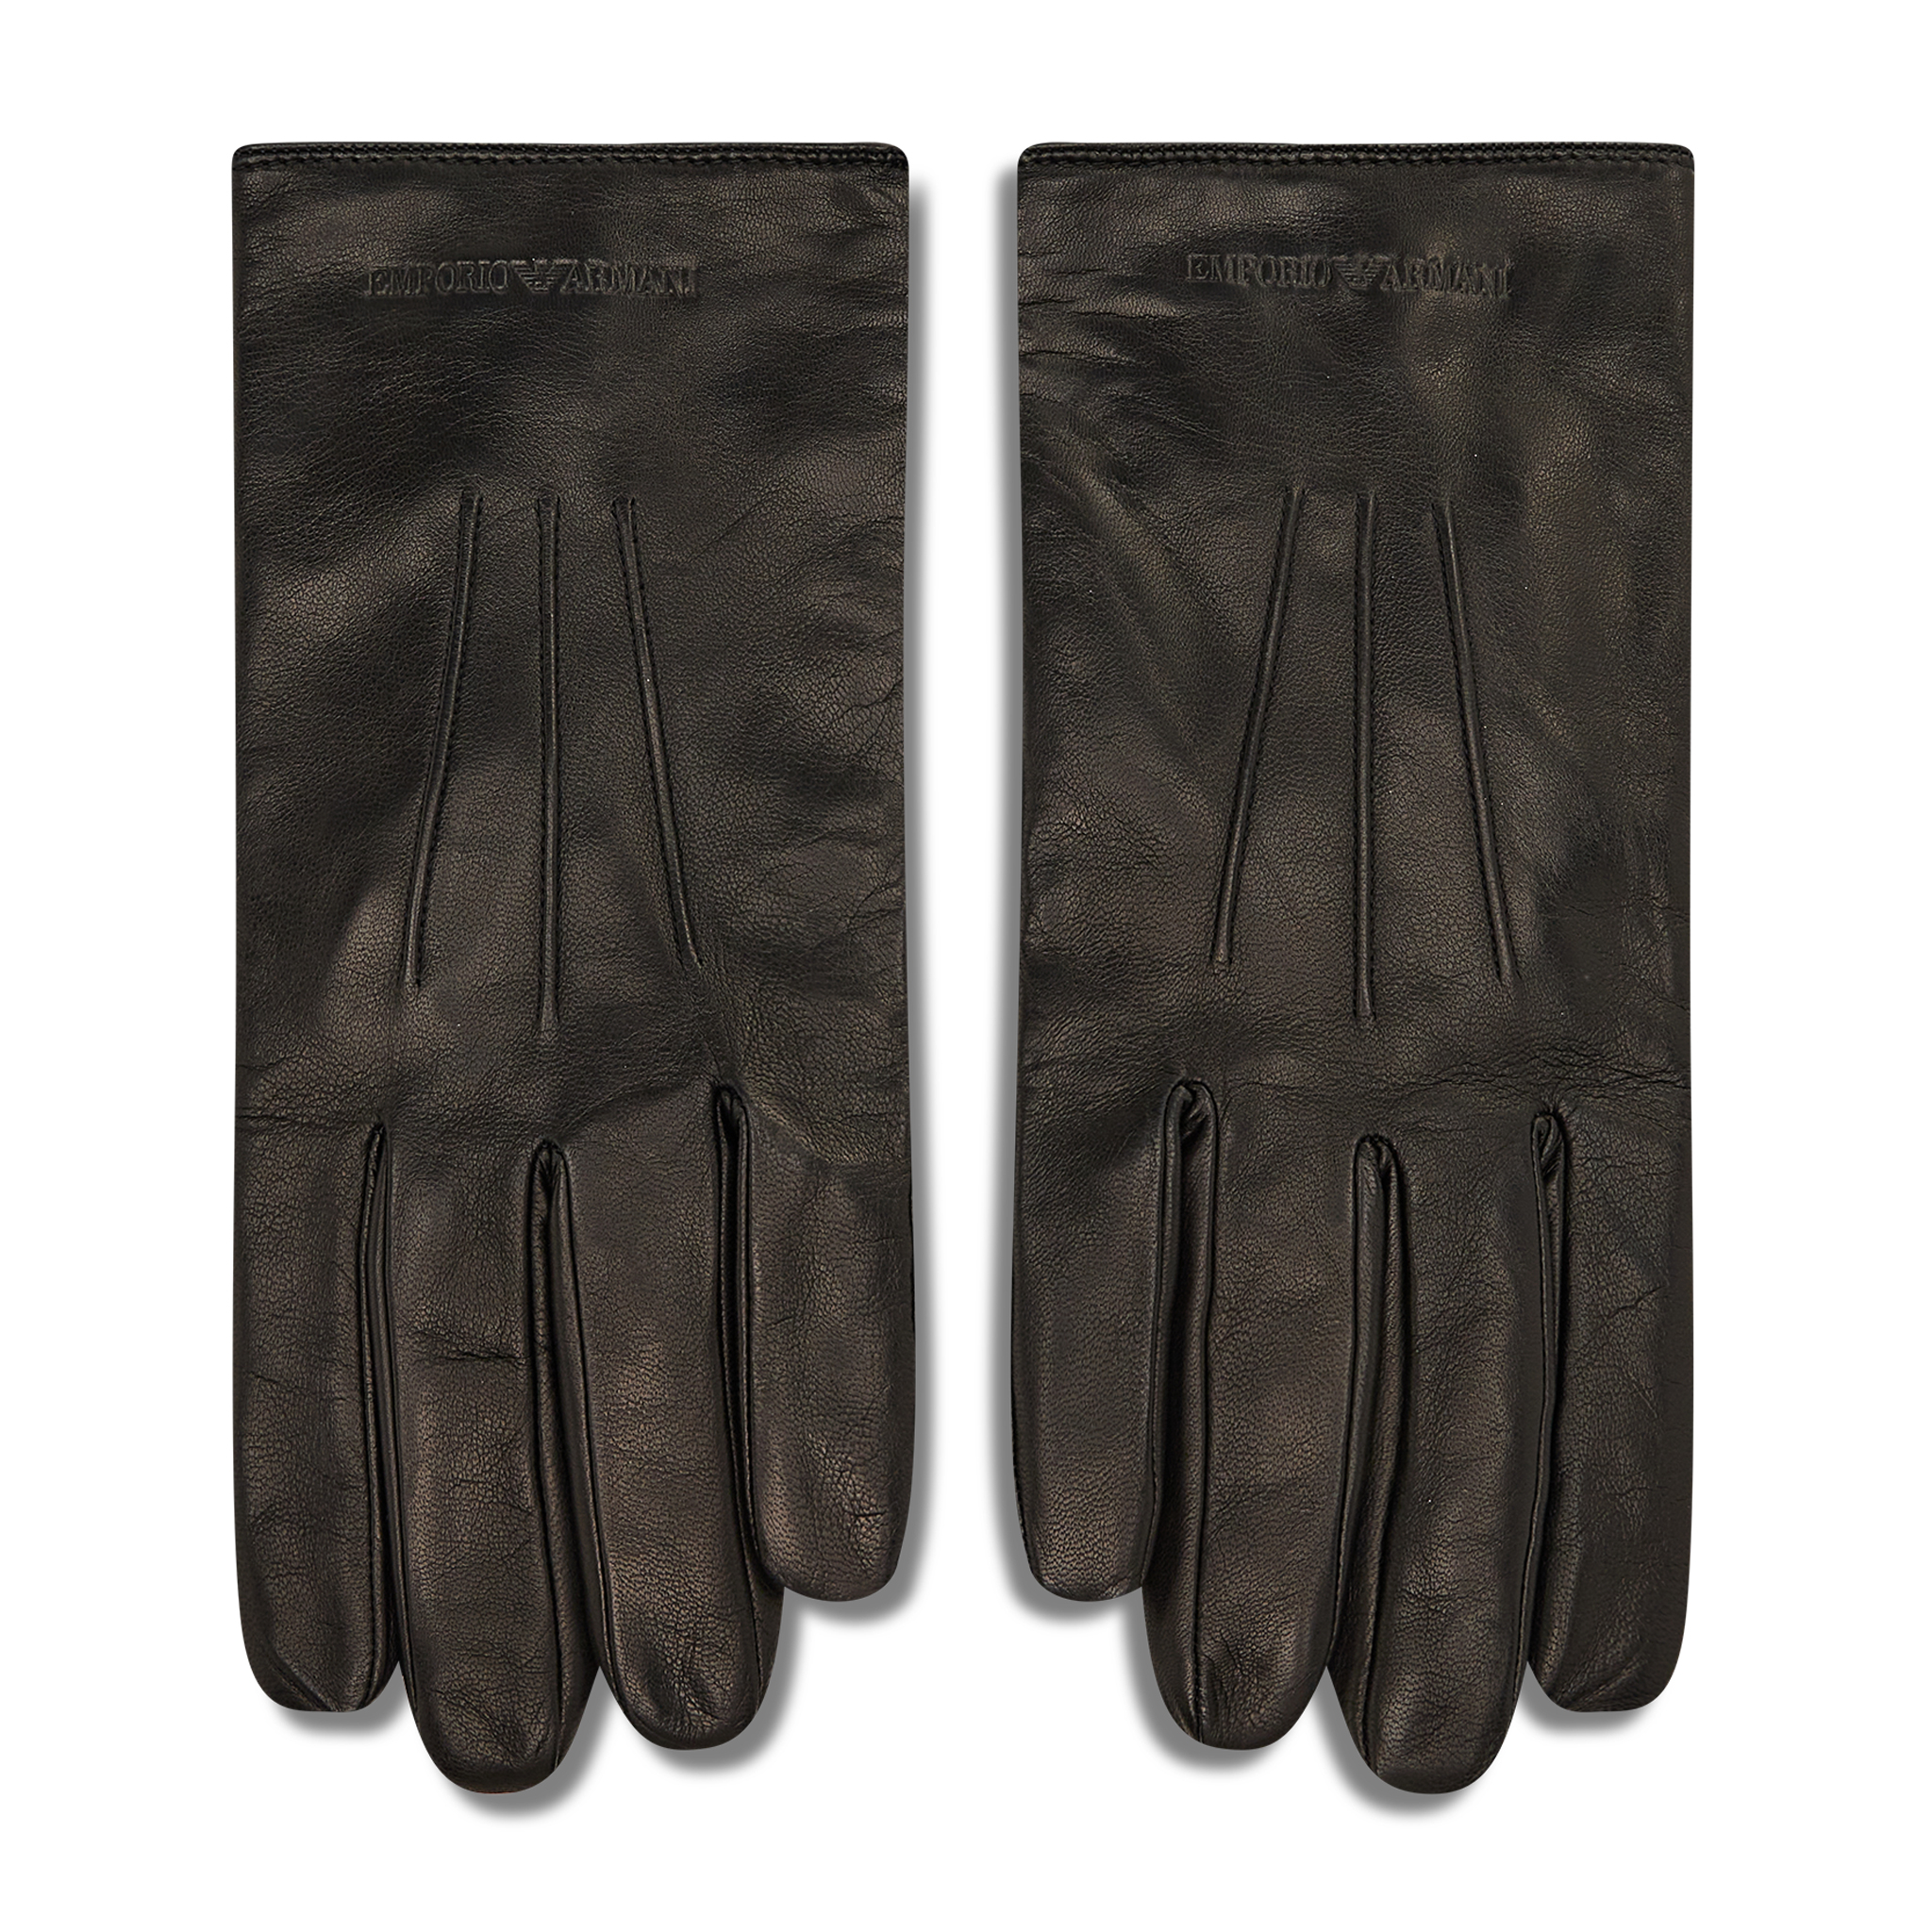 Image of Damenhandschuhe EMPORIO ARMANI - 624139 CC203 00020 Black